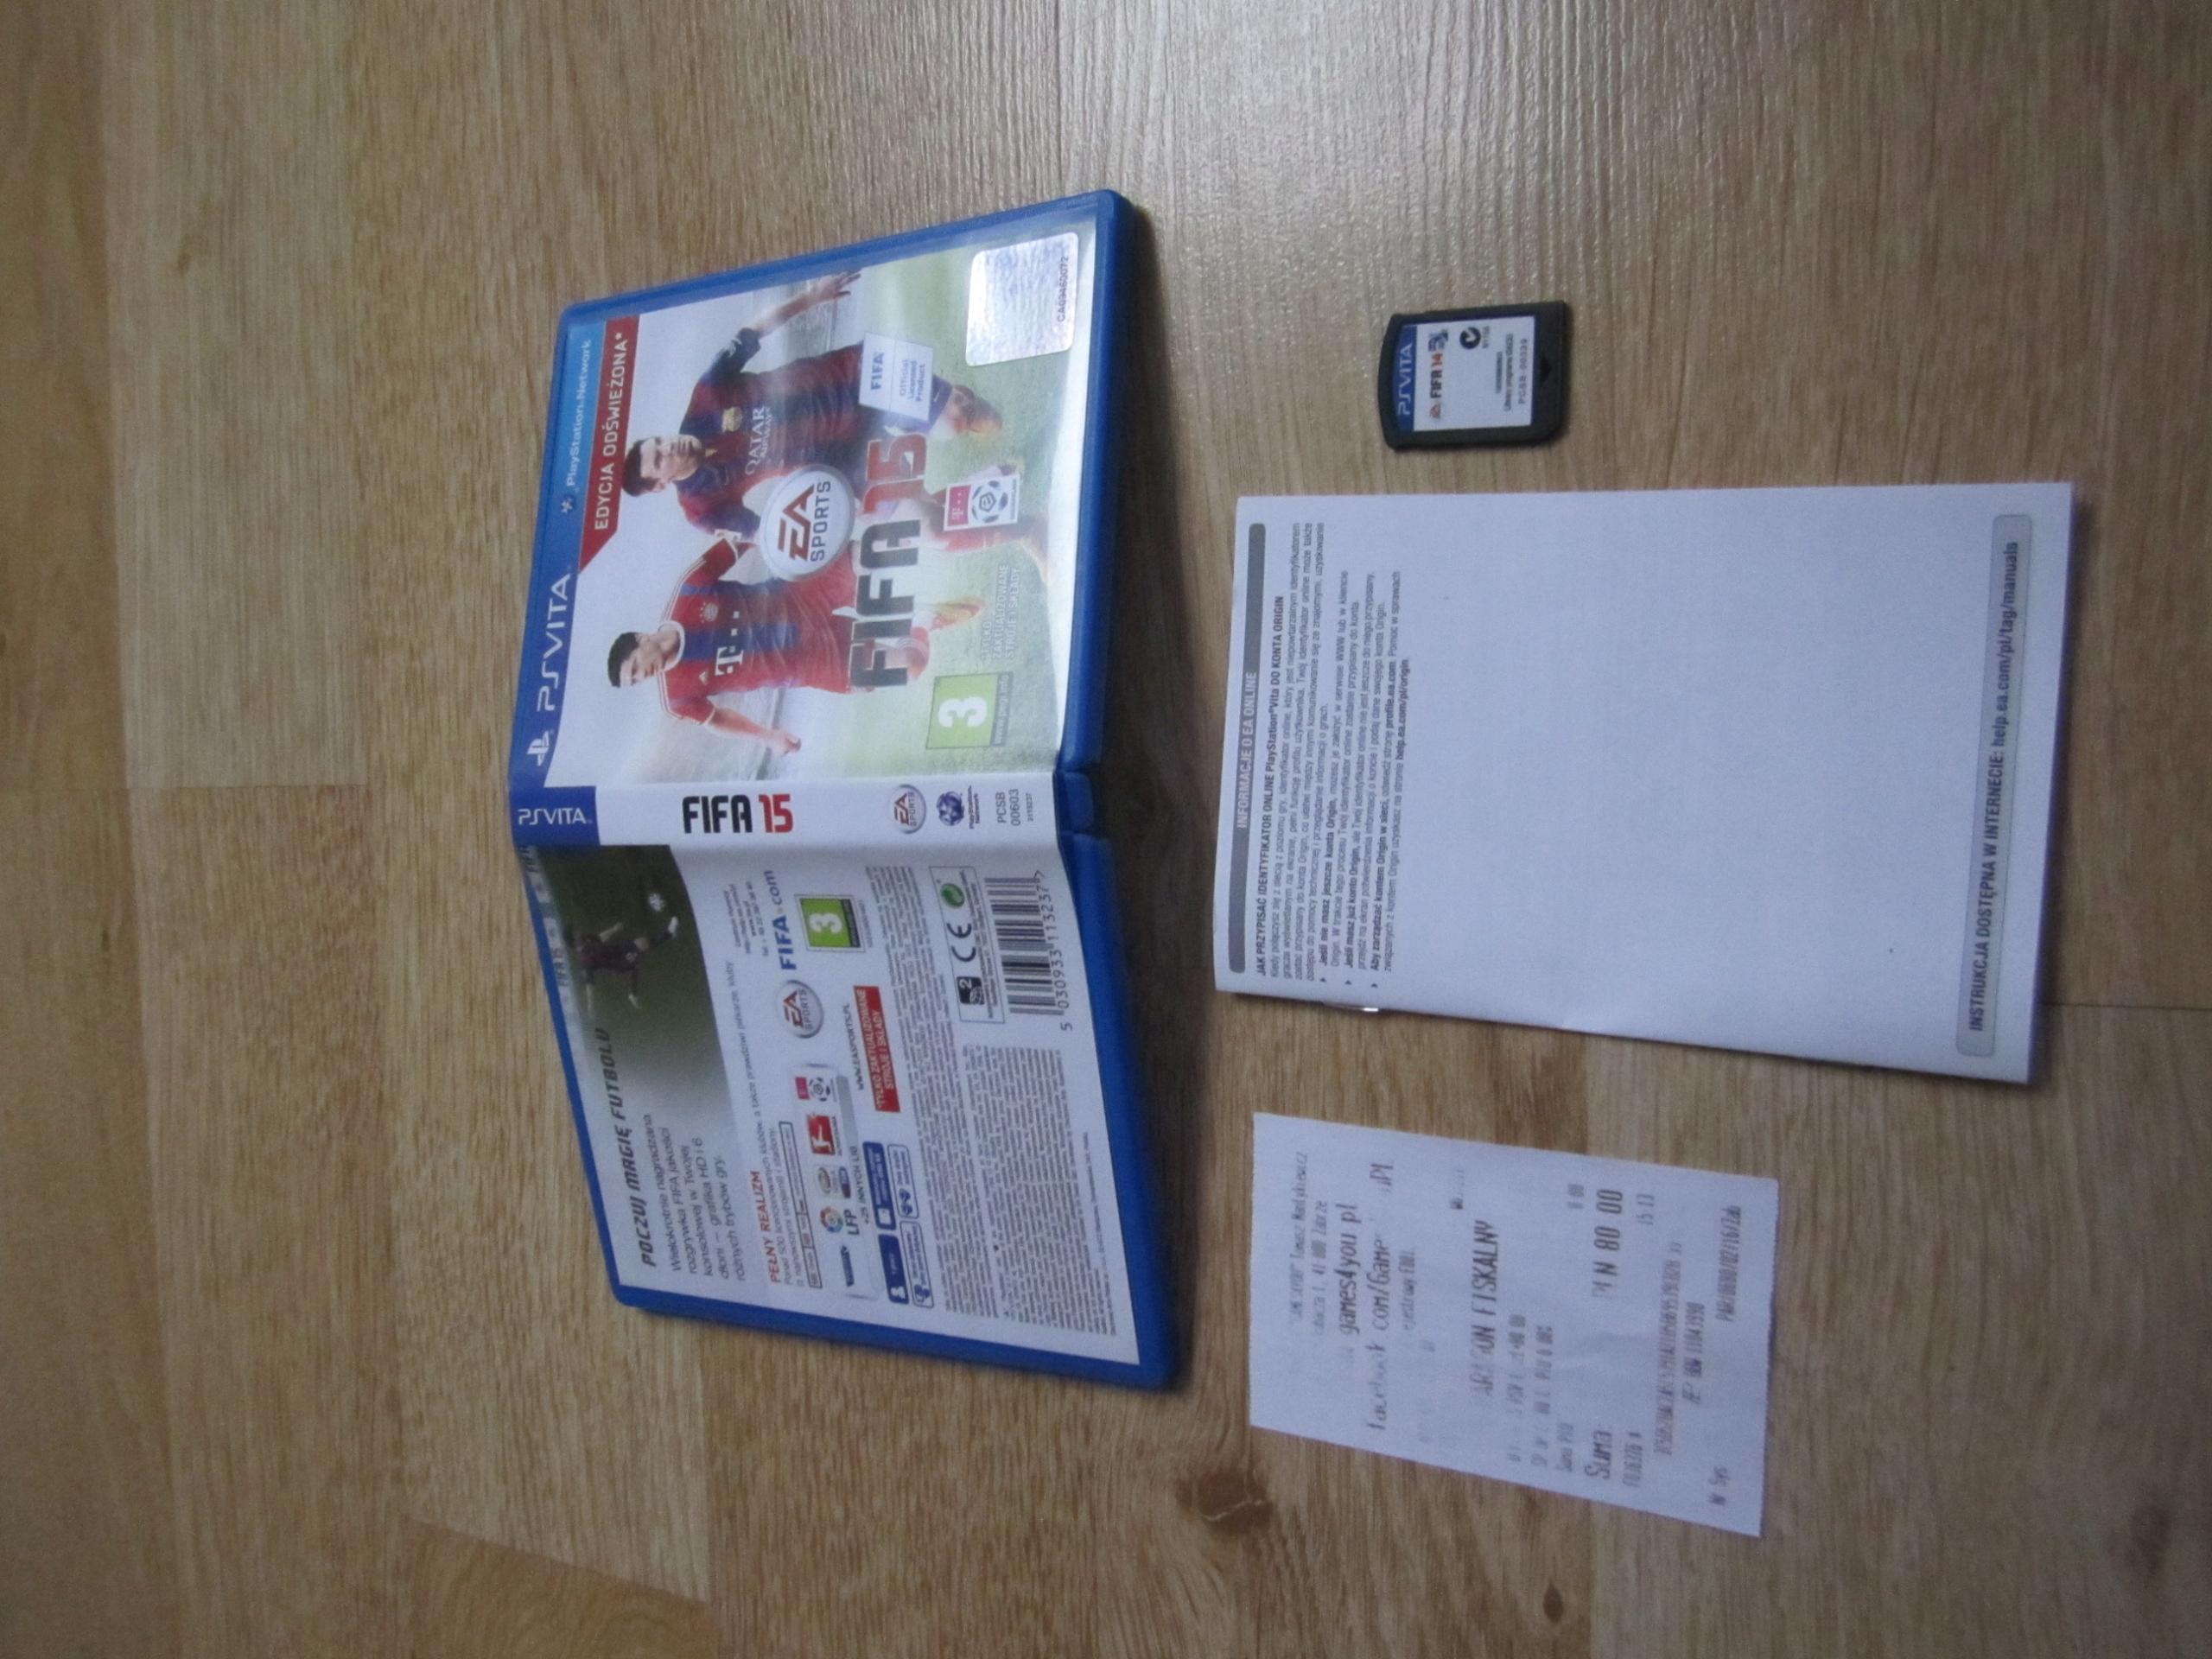 GRA Ps Vita Fifa15 Edycja Odswiezona PL